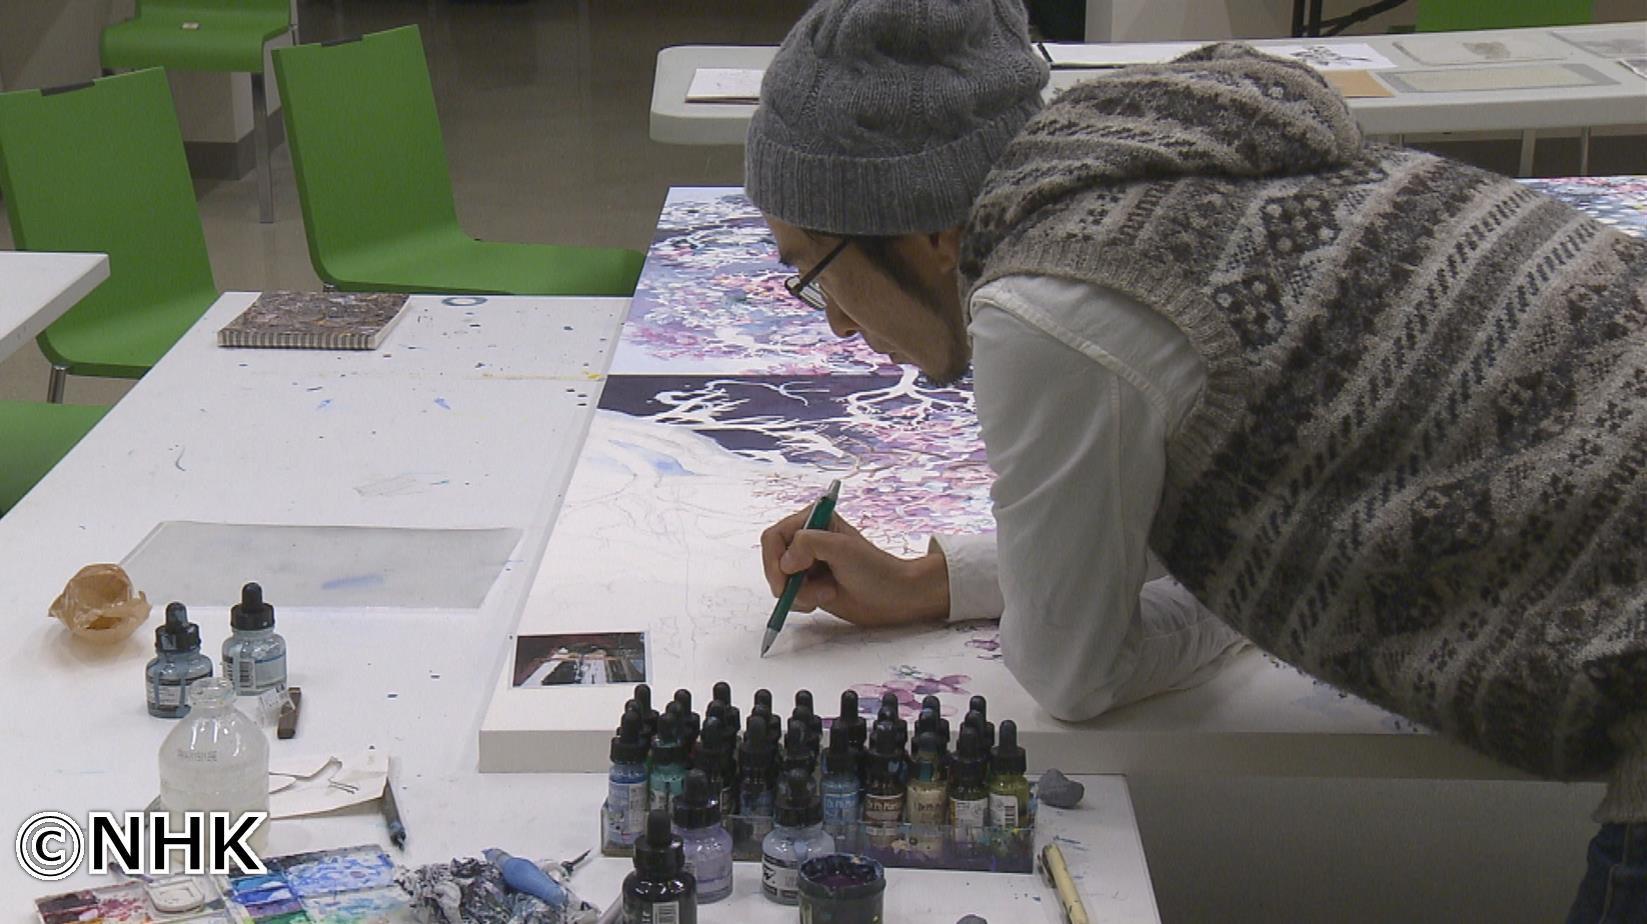 NHK BS1 「明日世界が終わるとしても」:ペン一本まだ見ぬ頂へ~画家・池田学~